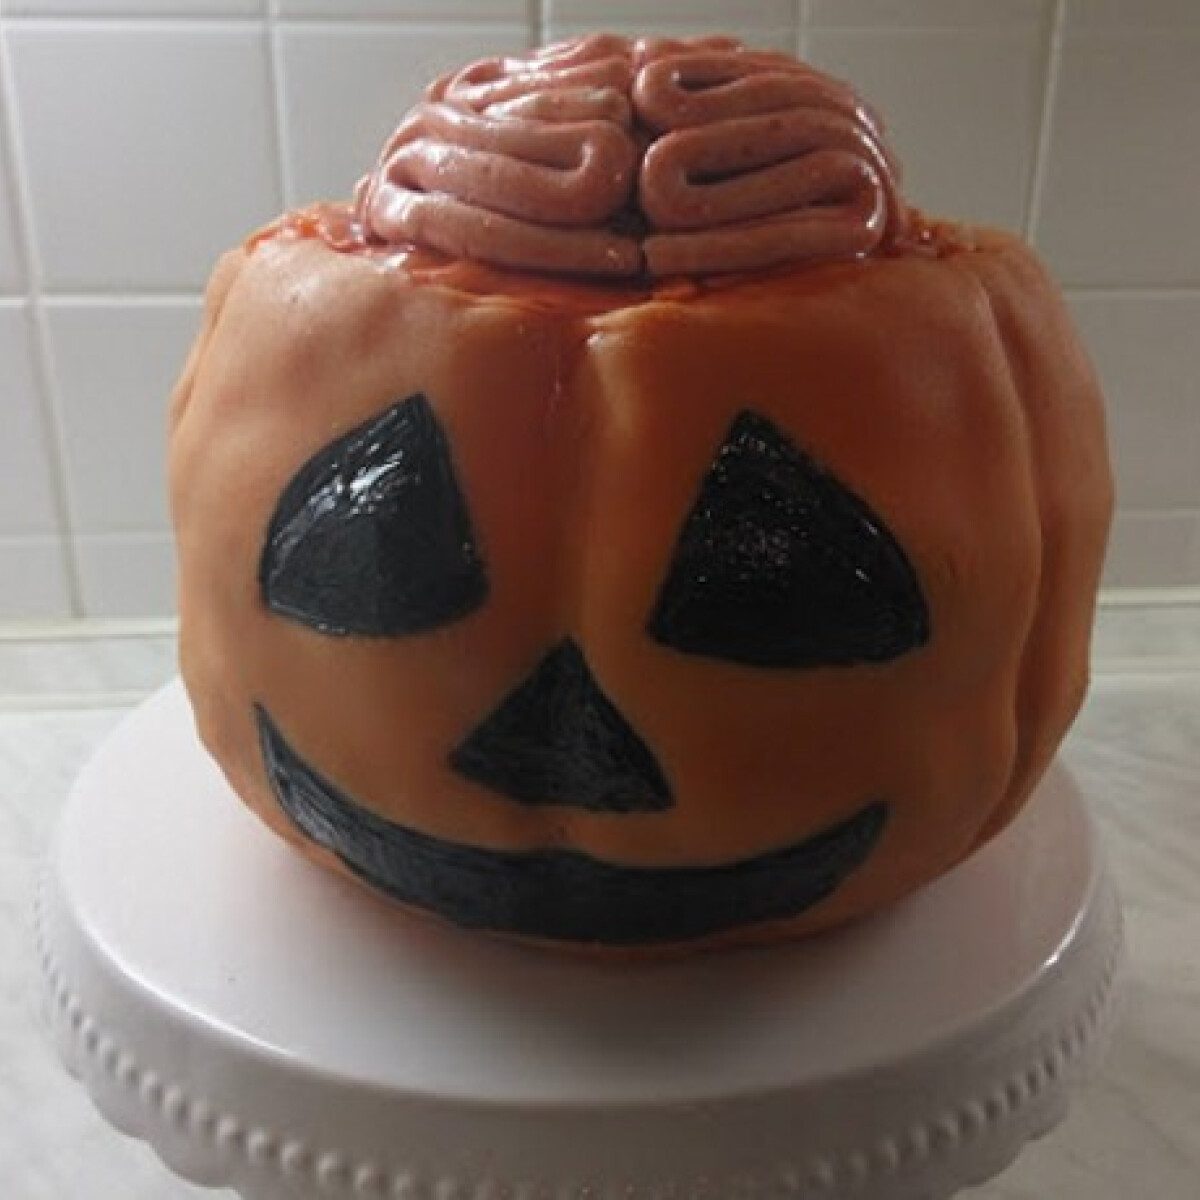 Hannibal Lecter tortája